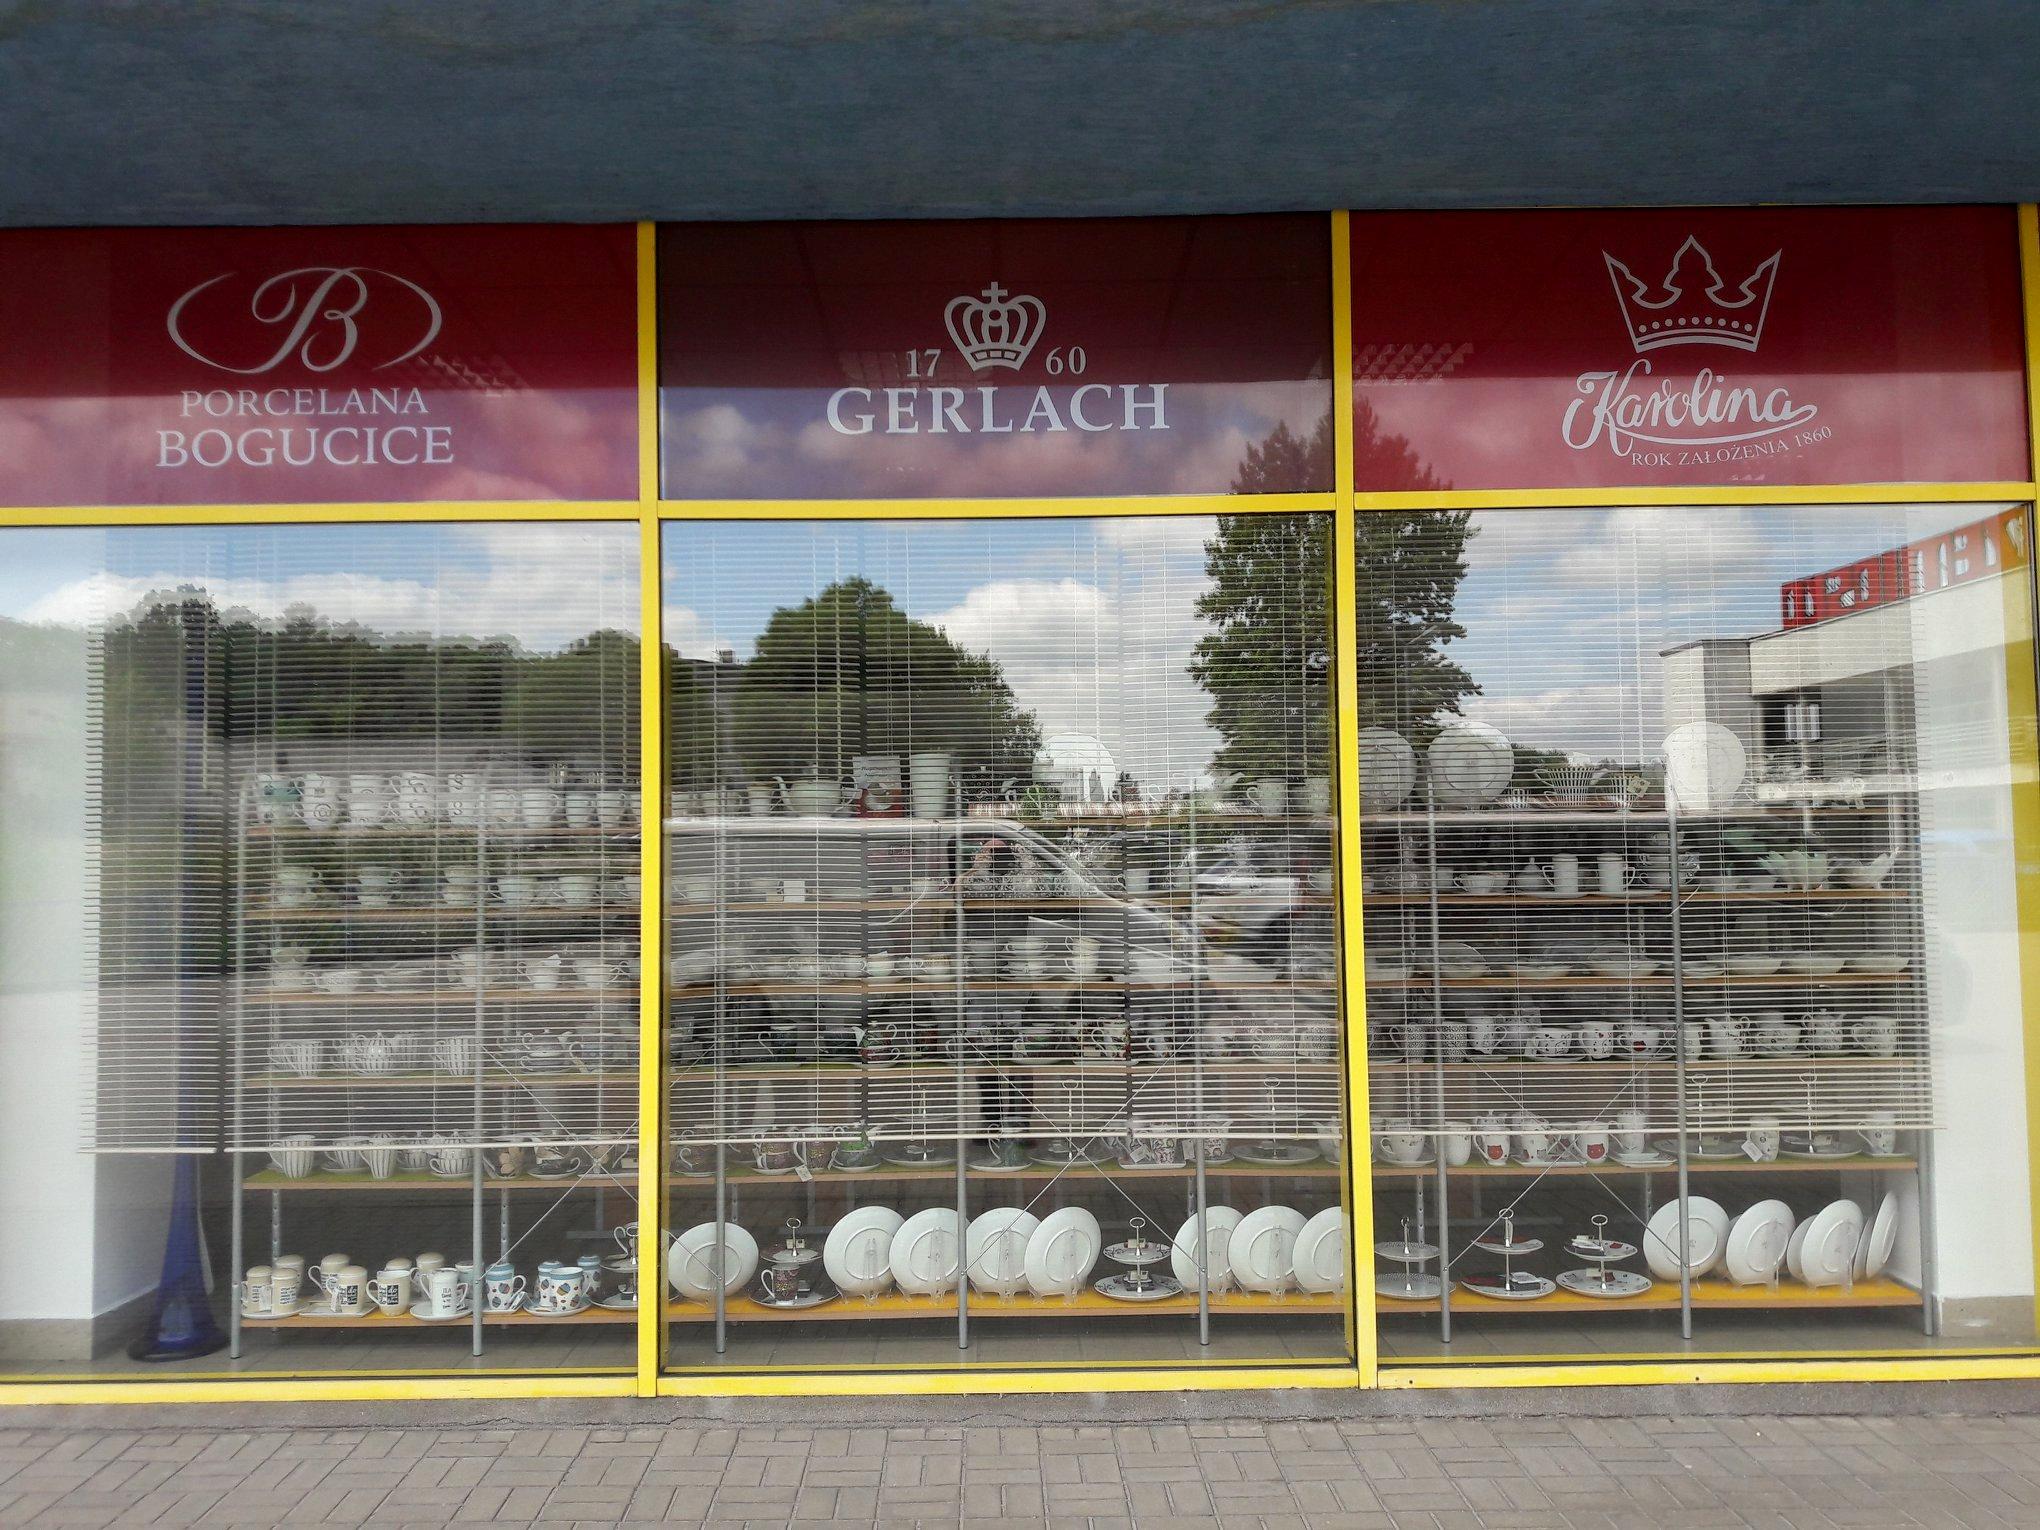 Porcelana Łódź salon wejście